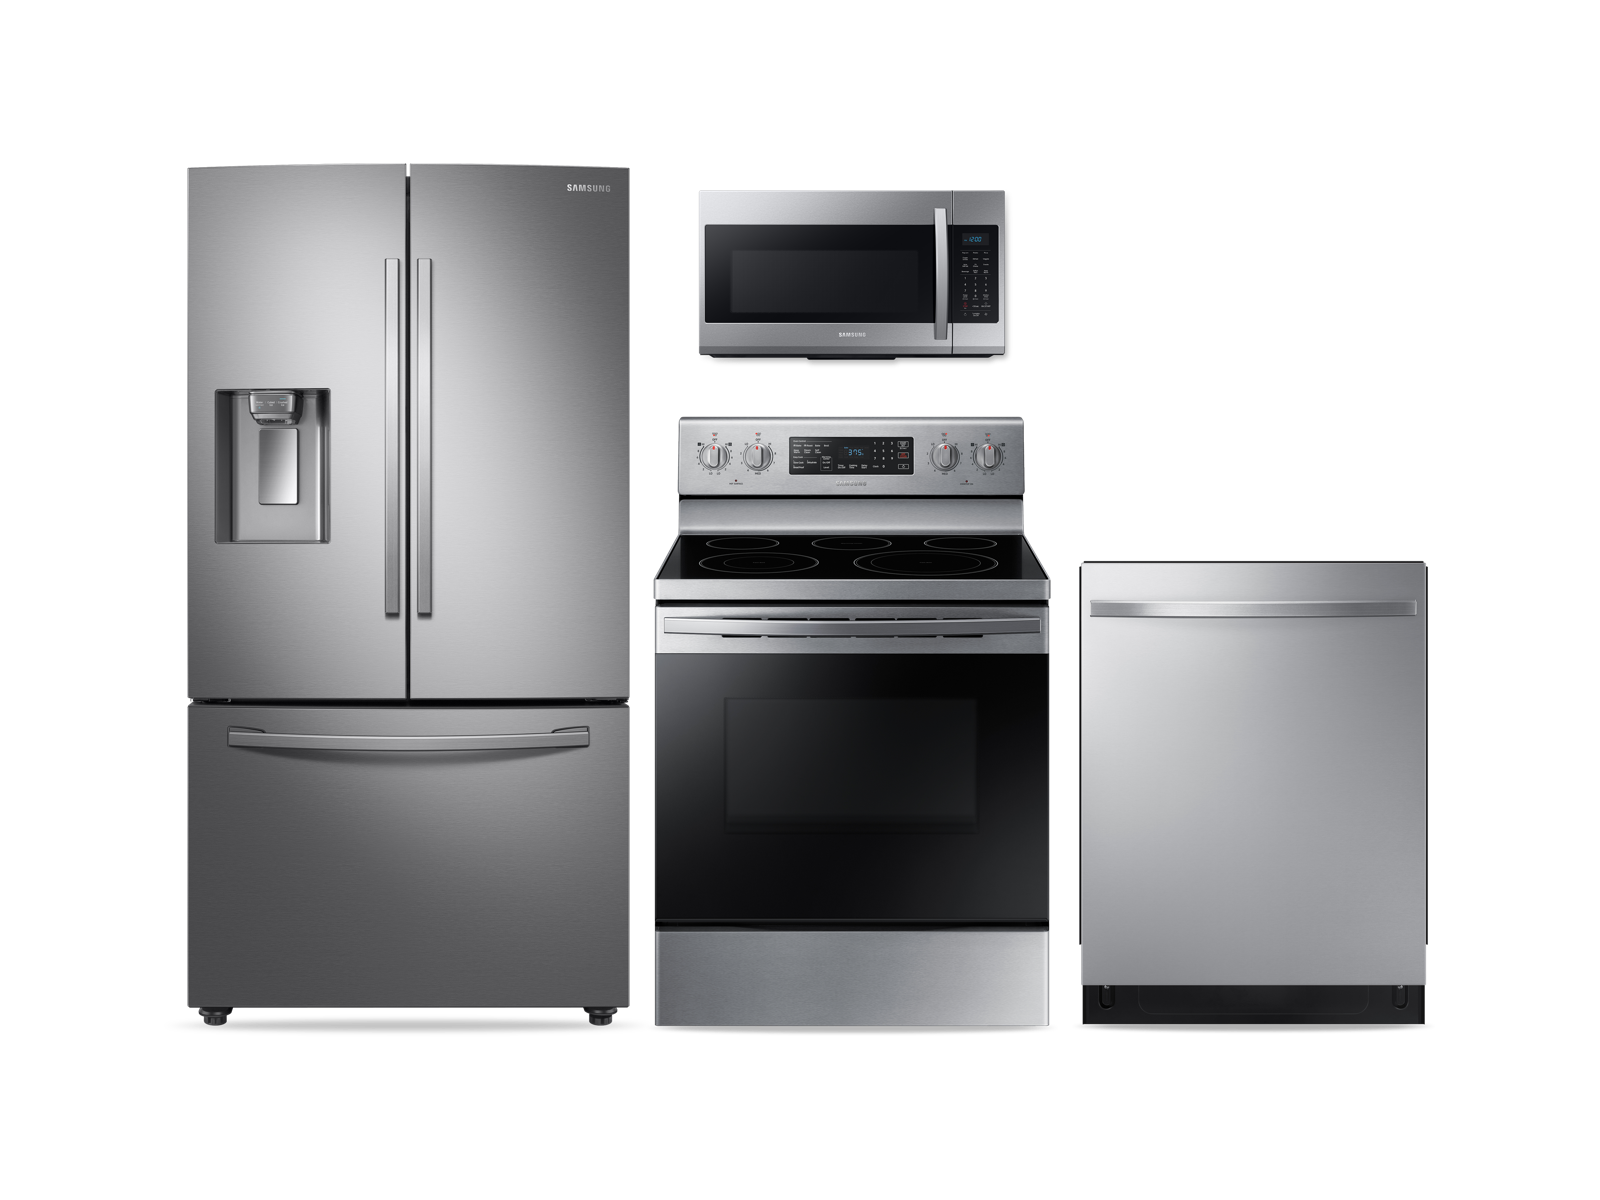 Samsung Large Capacity 3-door Refrigerator + Electric Range + StormWash Dishwasher + Microwave Kitchen Package in Stainless Steel